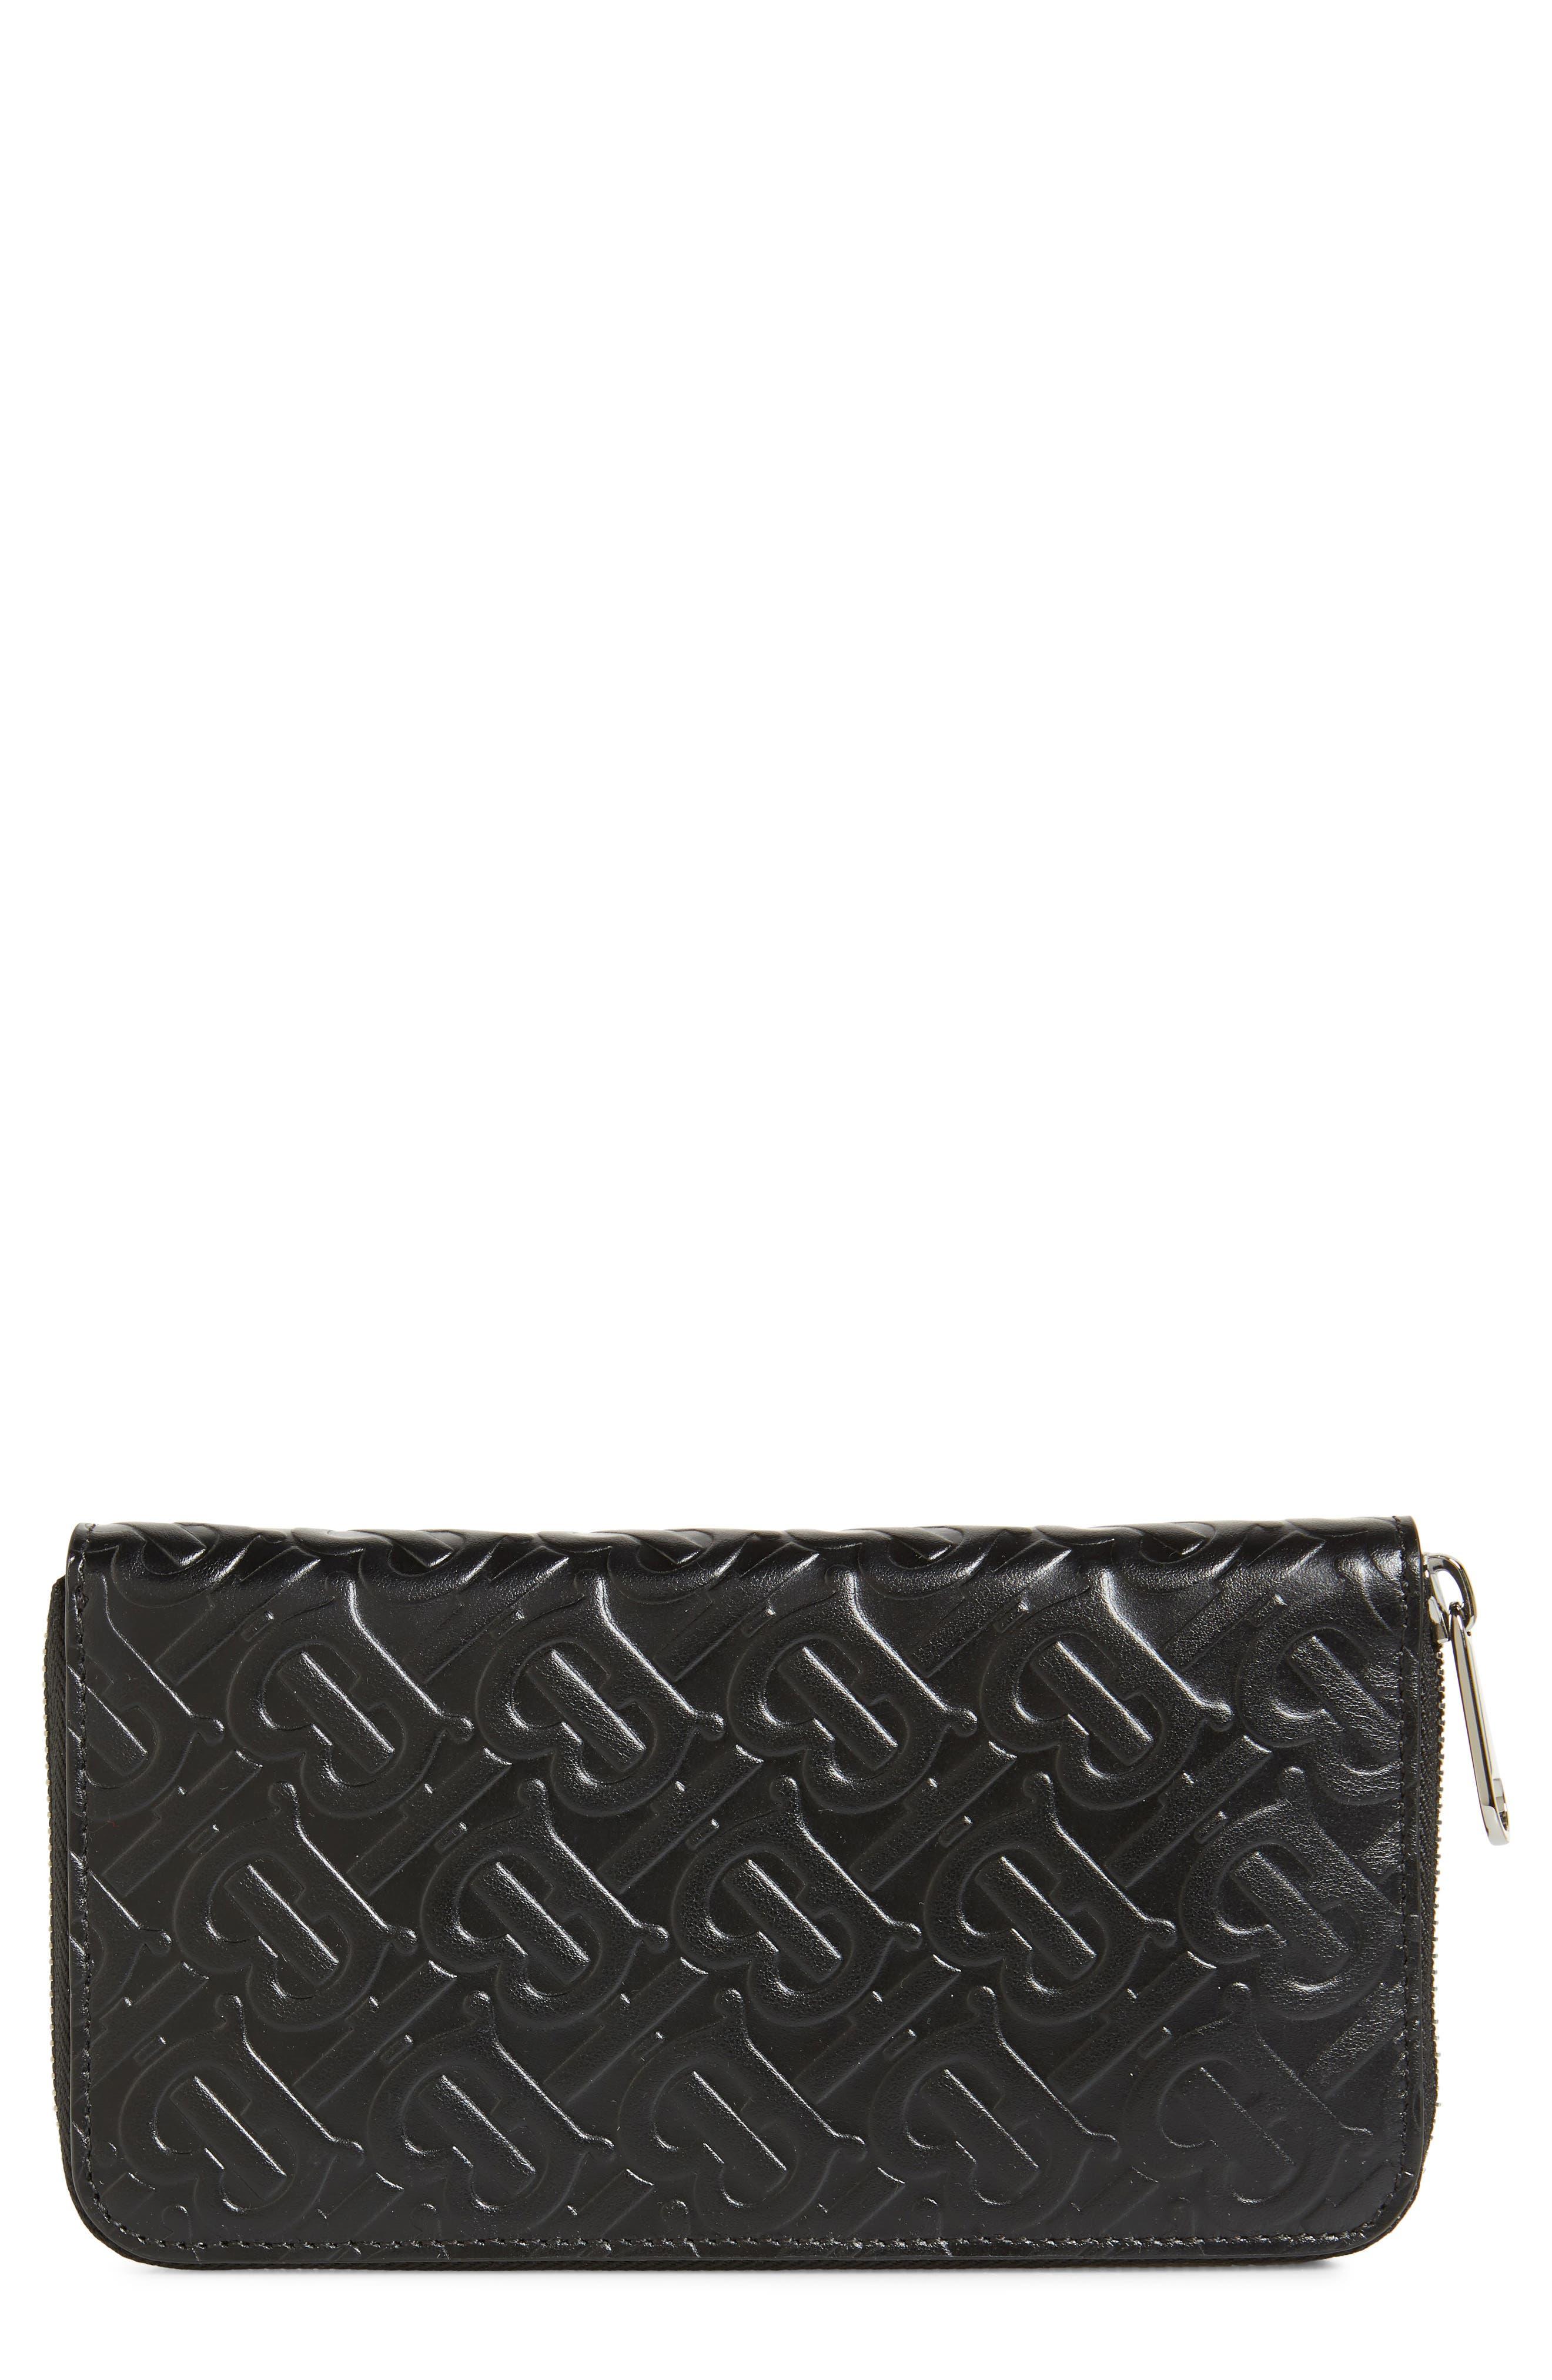 BURBERRY Large Monogram Leather Wallet, Main, color, BLACK